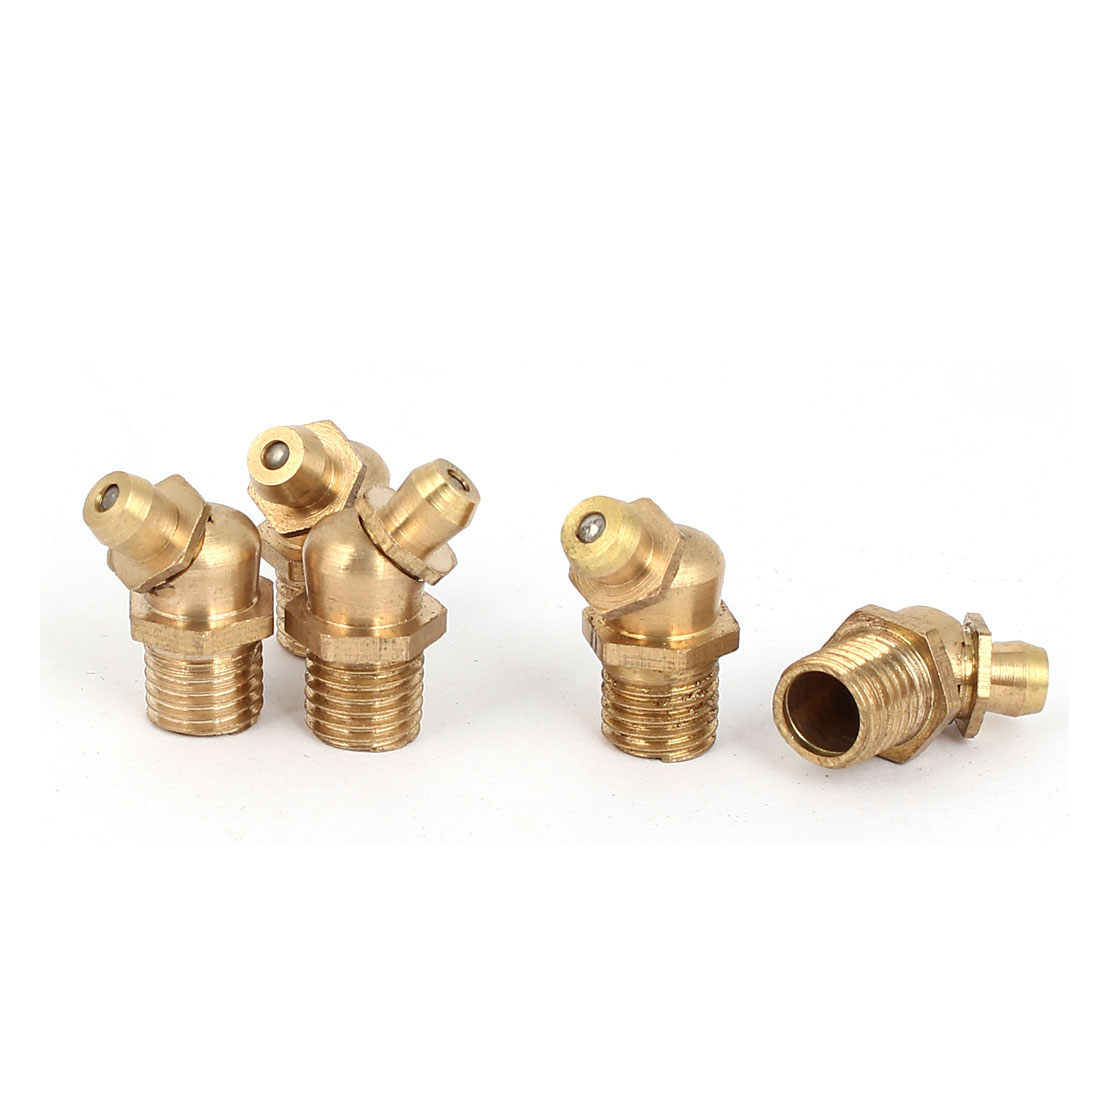 uxcell Brass 6mm Male Thread Hydraulic Grease Nipple 5Pcs